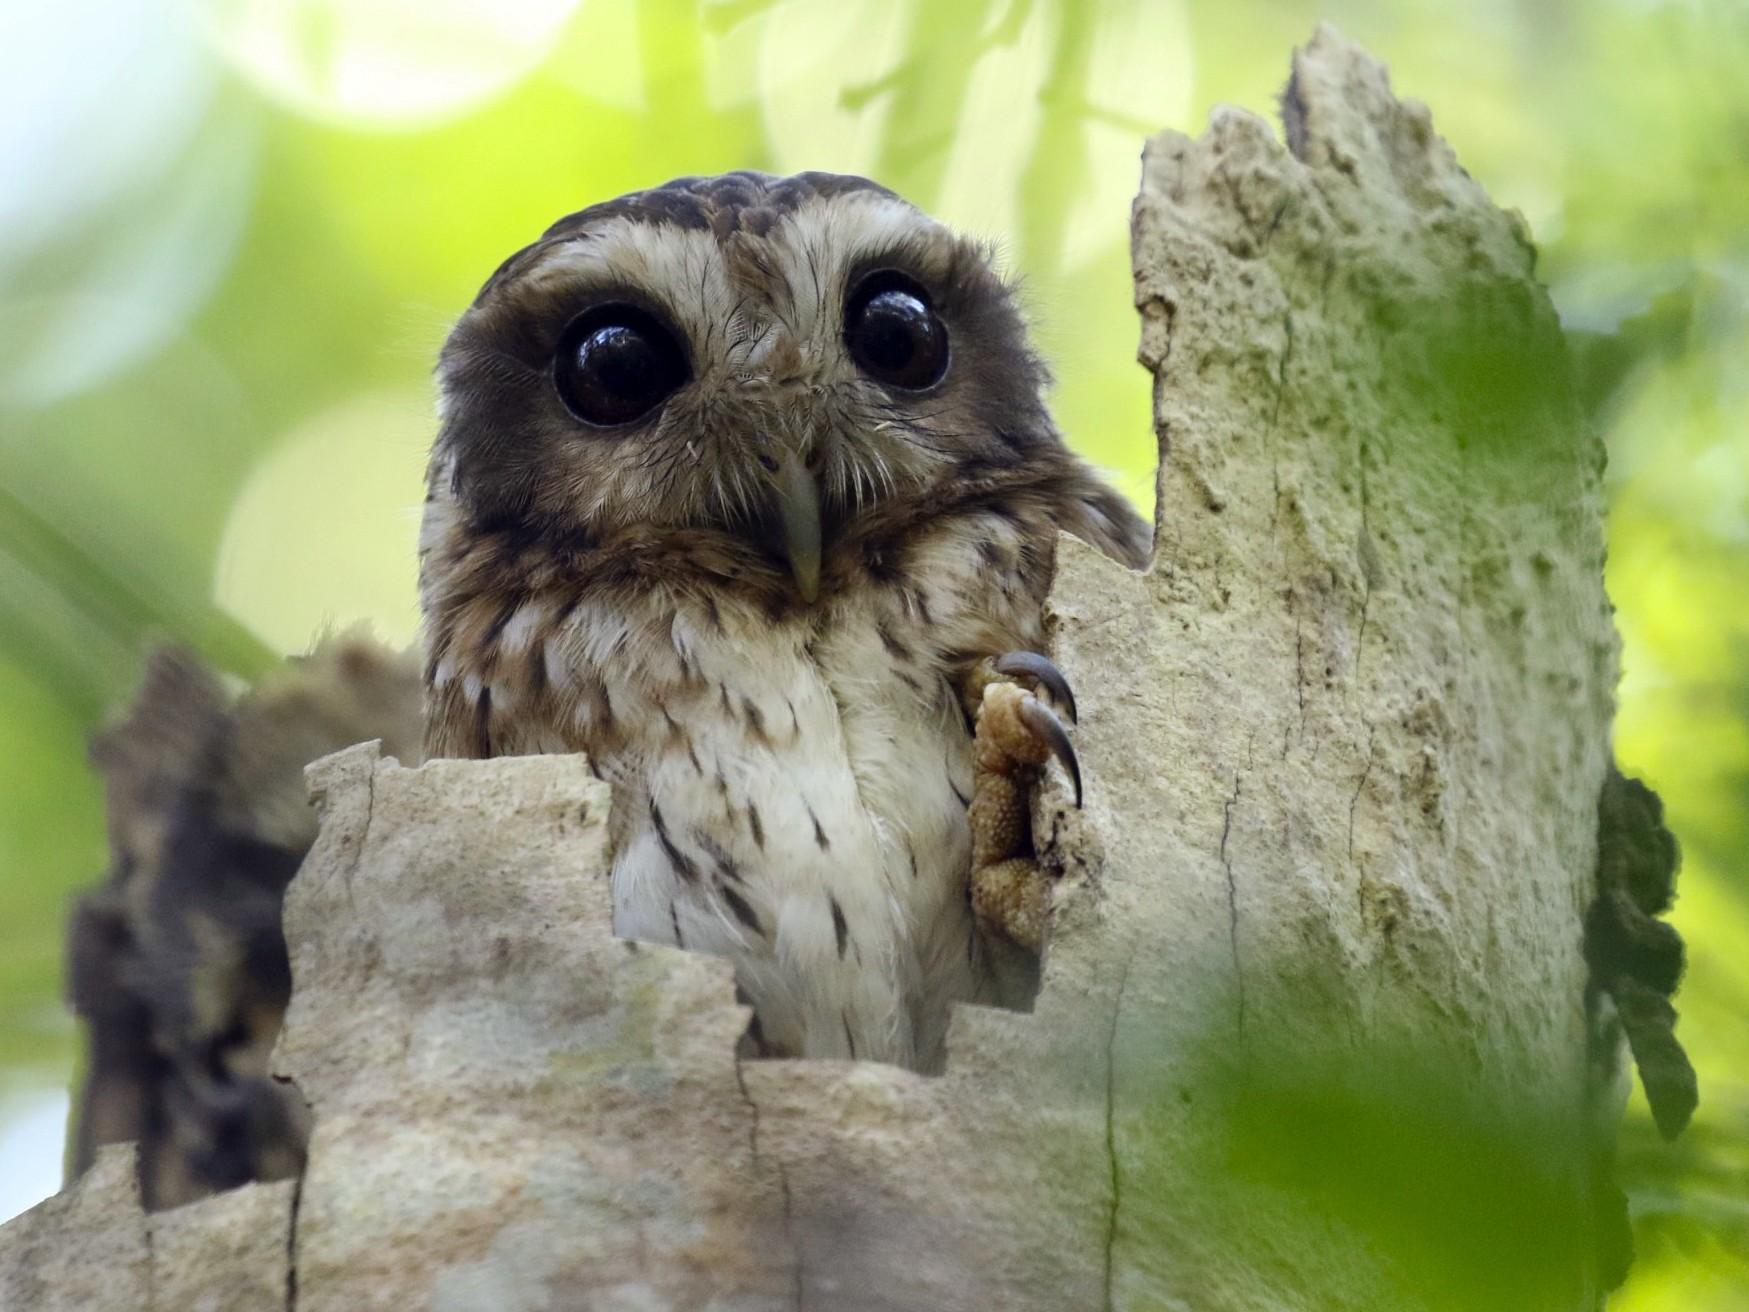 Bare-legged Owl - Knut Hansen